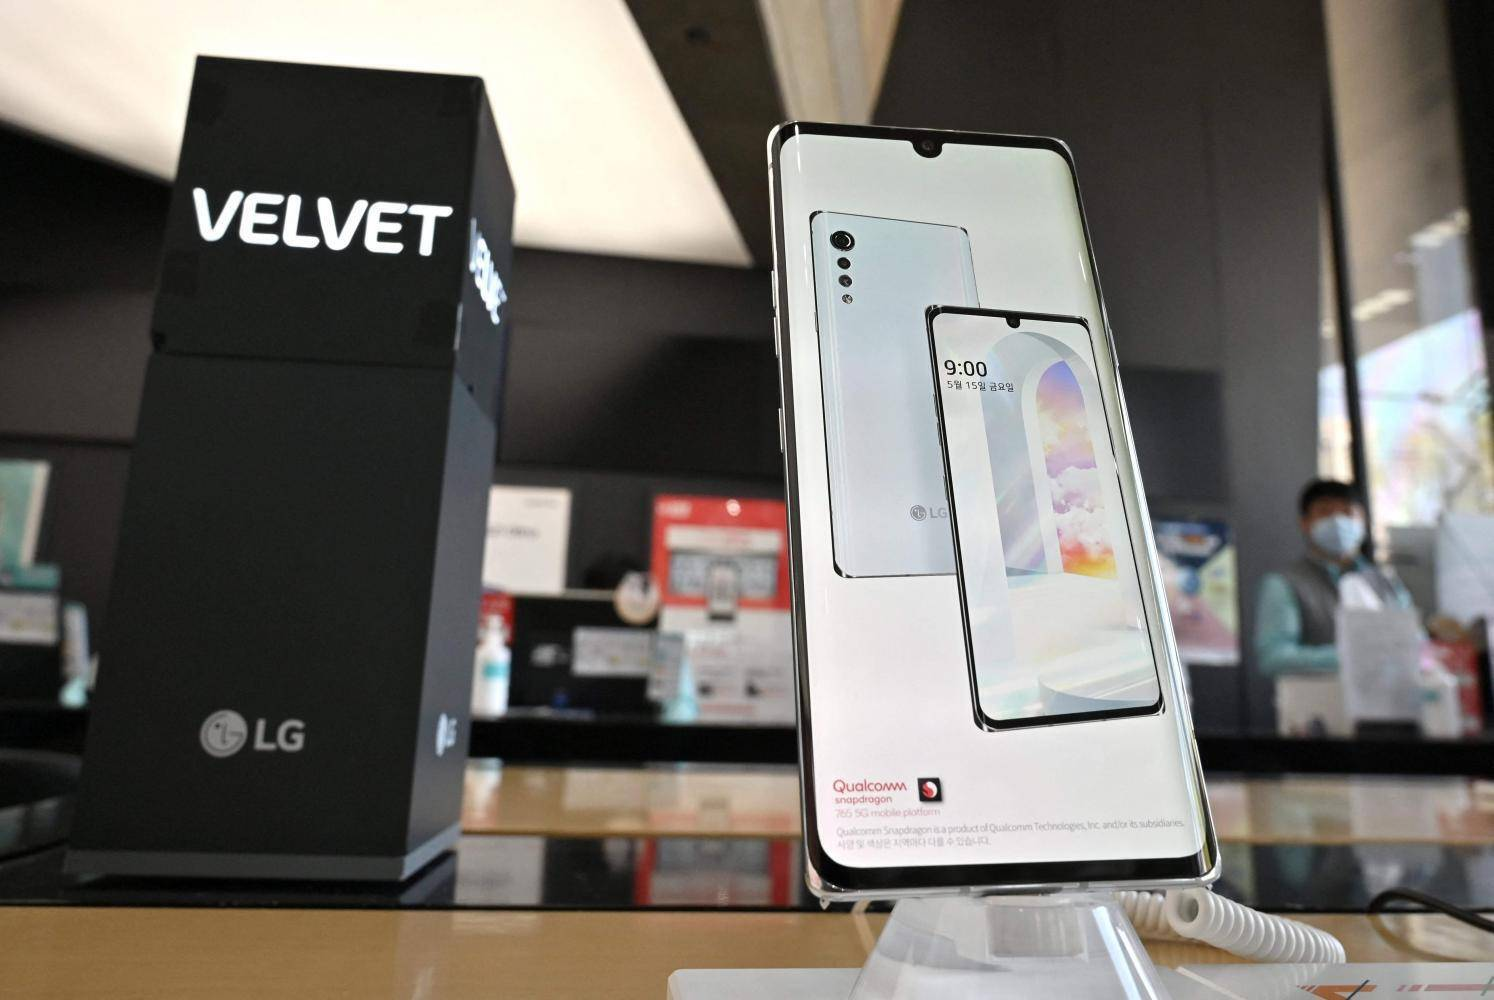 648x415 lg proposera des mises a jour android durant 3 ans malgre la fermeture de sa division smartphone